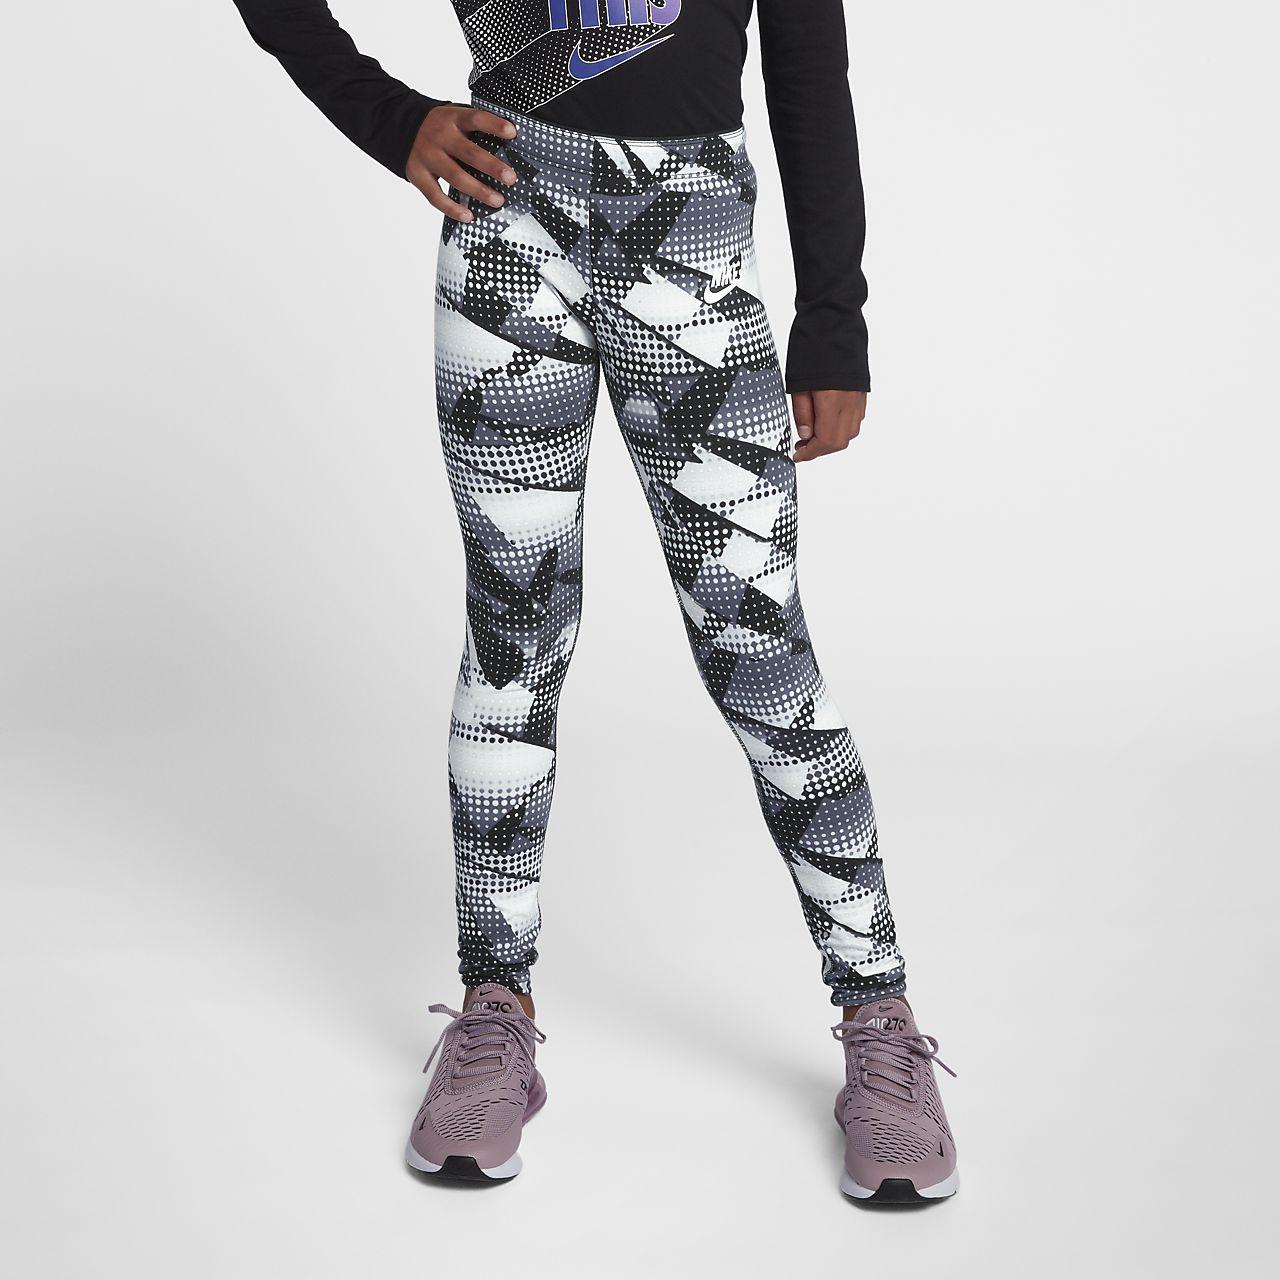 06e660534de9 Nike Sportswear Older Kids' (Girls') Printed Leggings. Nike.com NL